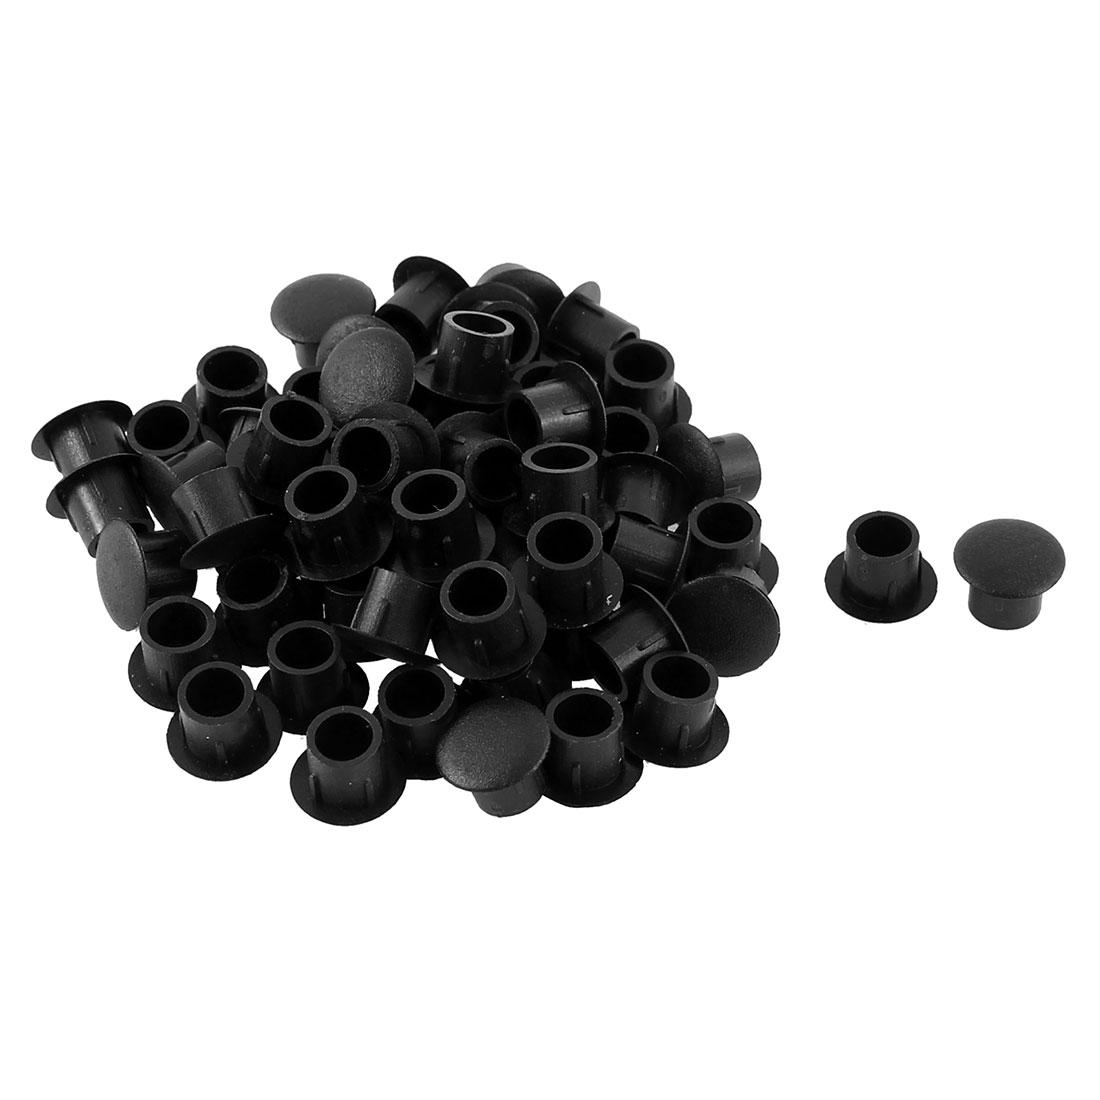 Kitchen Wardrobe Decor Locking Hole Cover Tube Insert Black 8mm Dia 60pcs